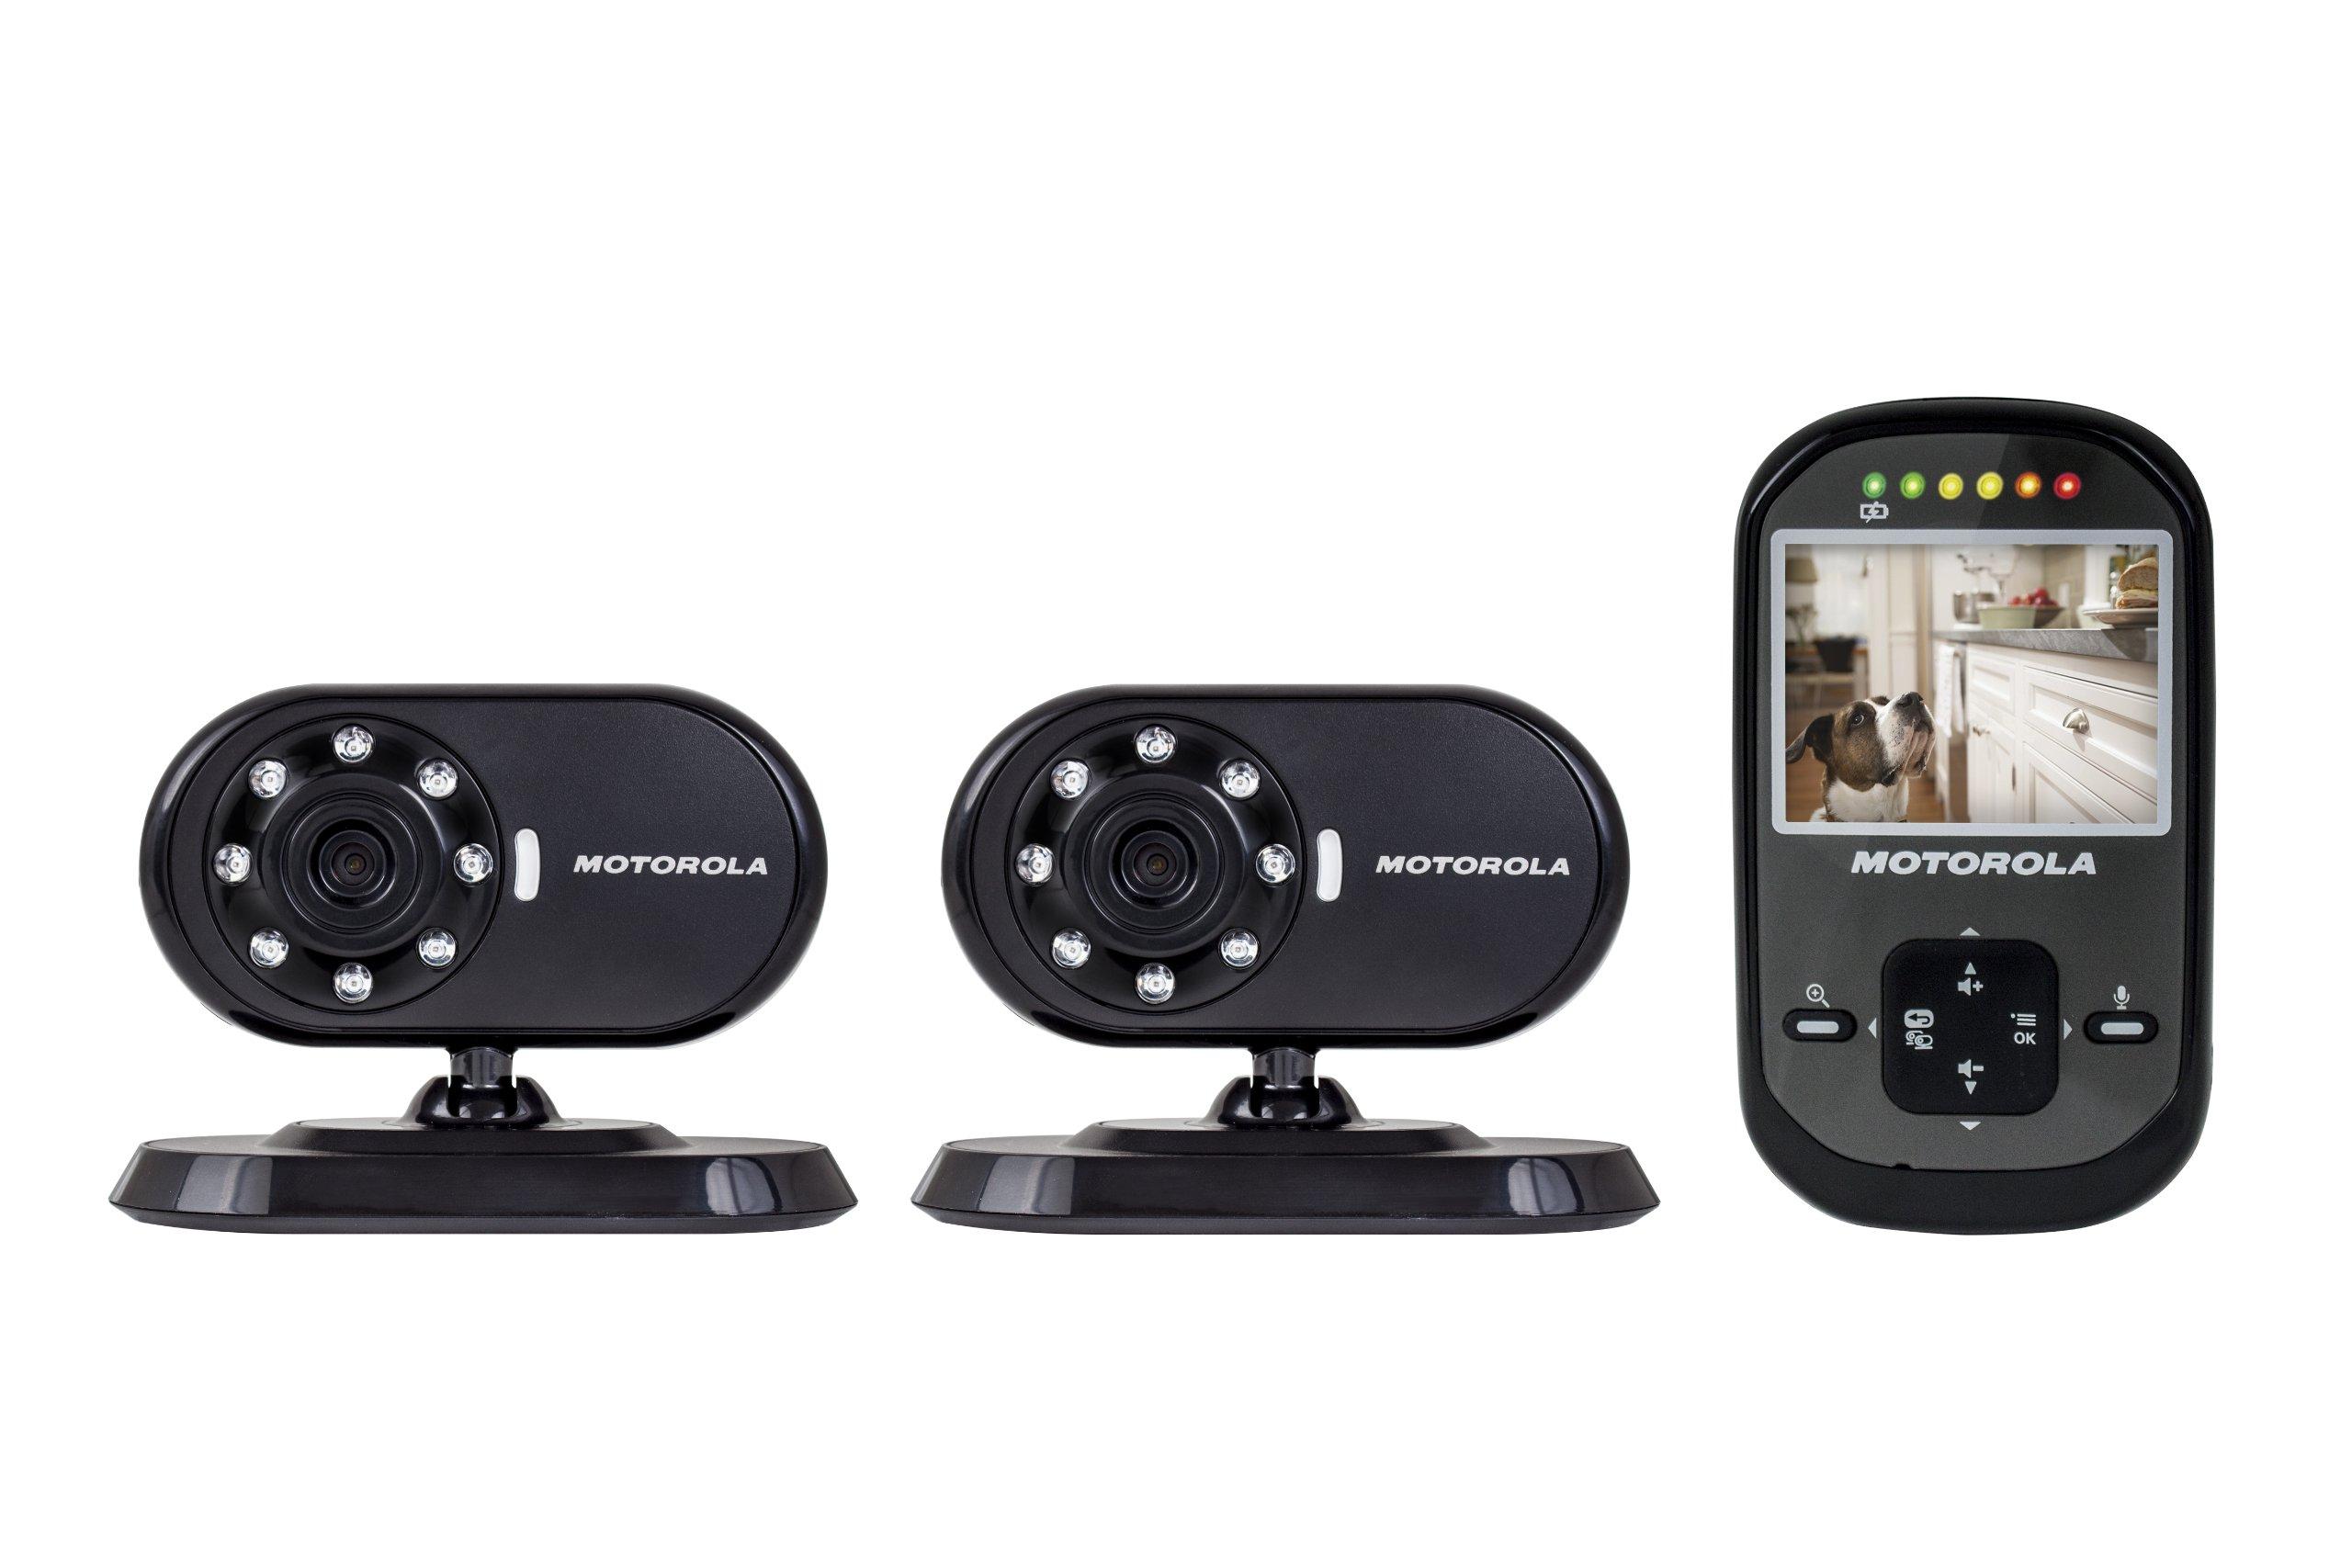 Motorola Pet Scout500-2 Remote Wireless Pet Monitor